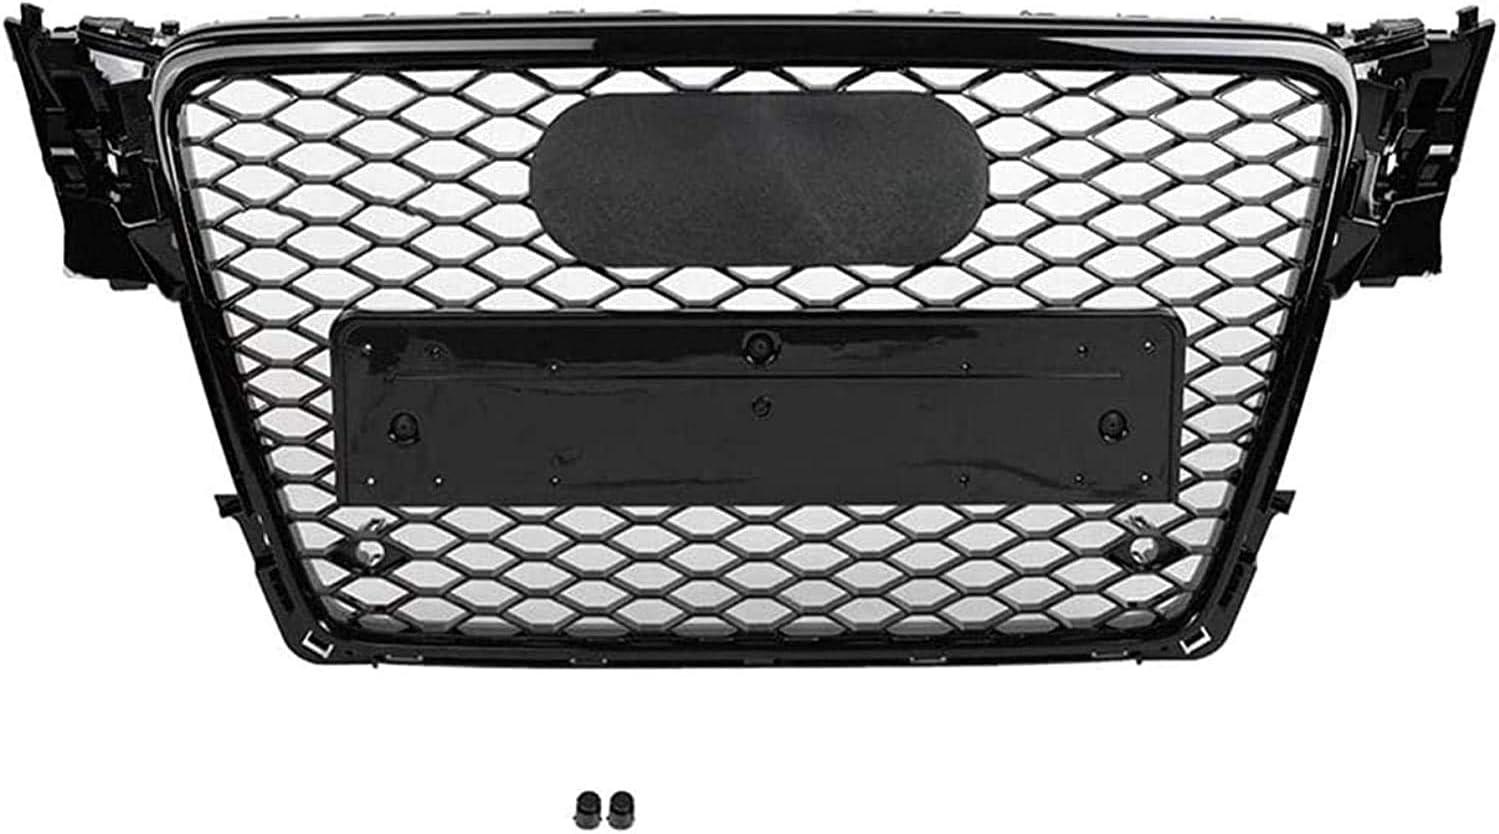 Adecuado para AUD-I A4 // S4 B8 2009 2010 2011 2012 Rs4 Gloss Black Style ACYCY Rejilla del Radiador Sport Hexagon Mesh Nido De Abeja Black Black Black